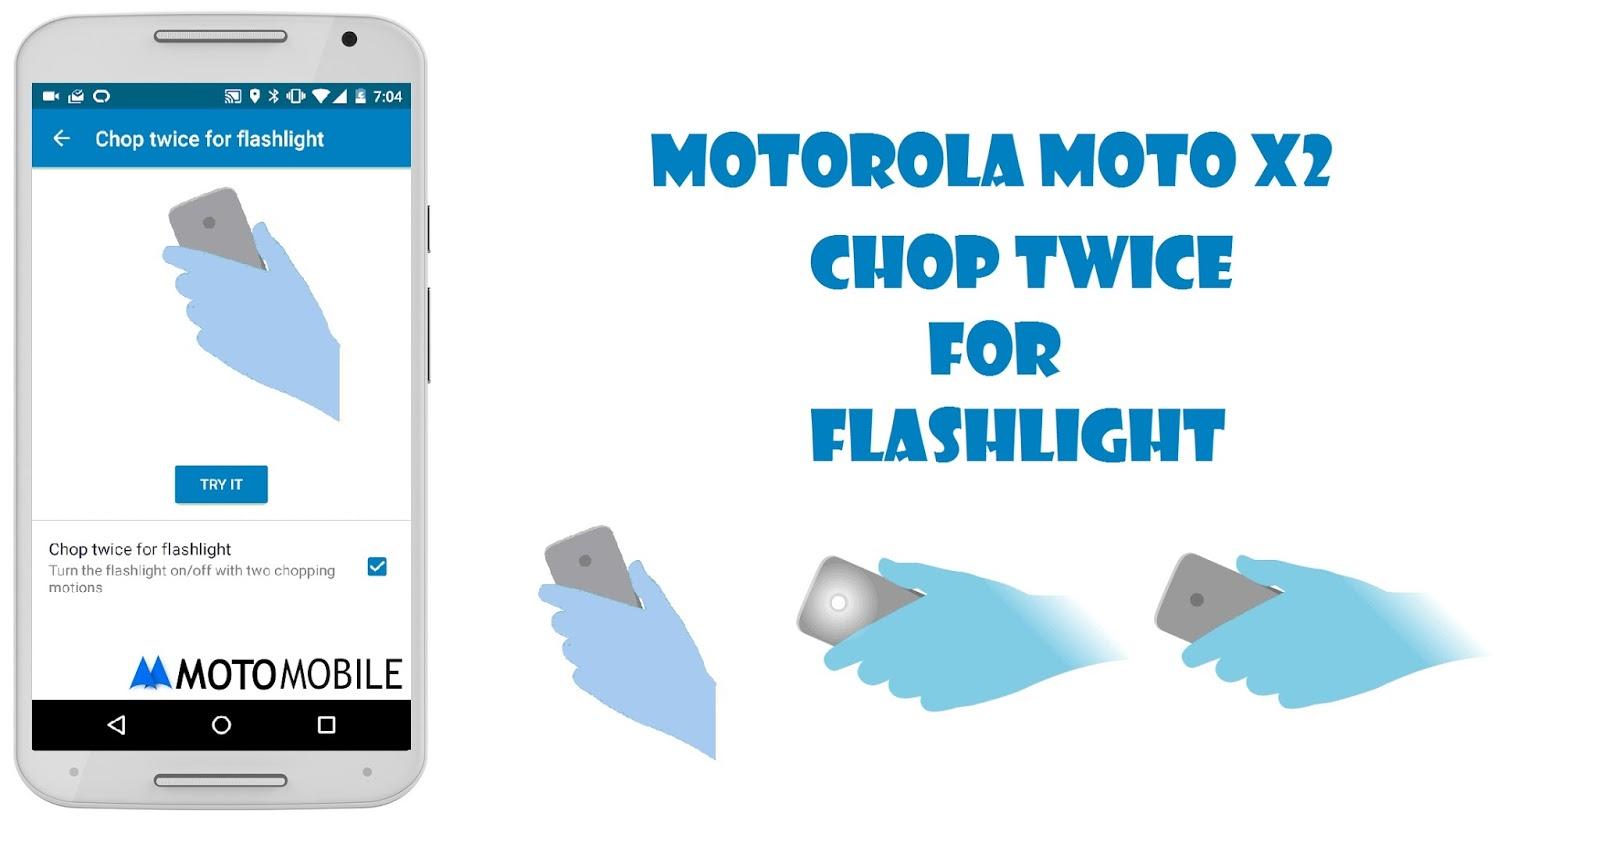 Chop twice for Flashlight Moto X